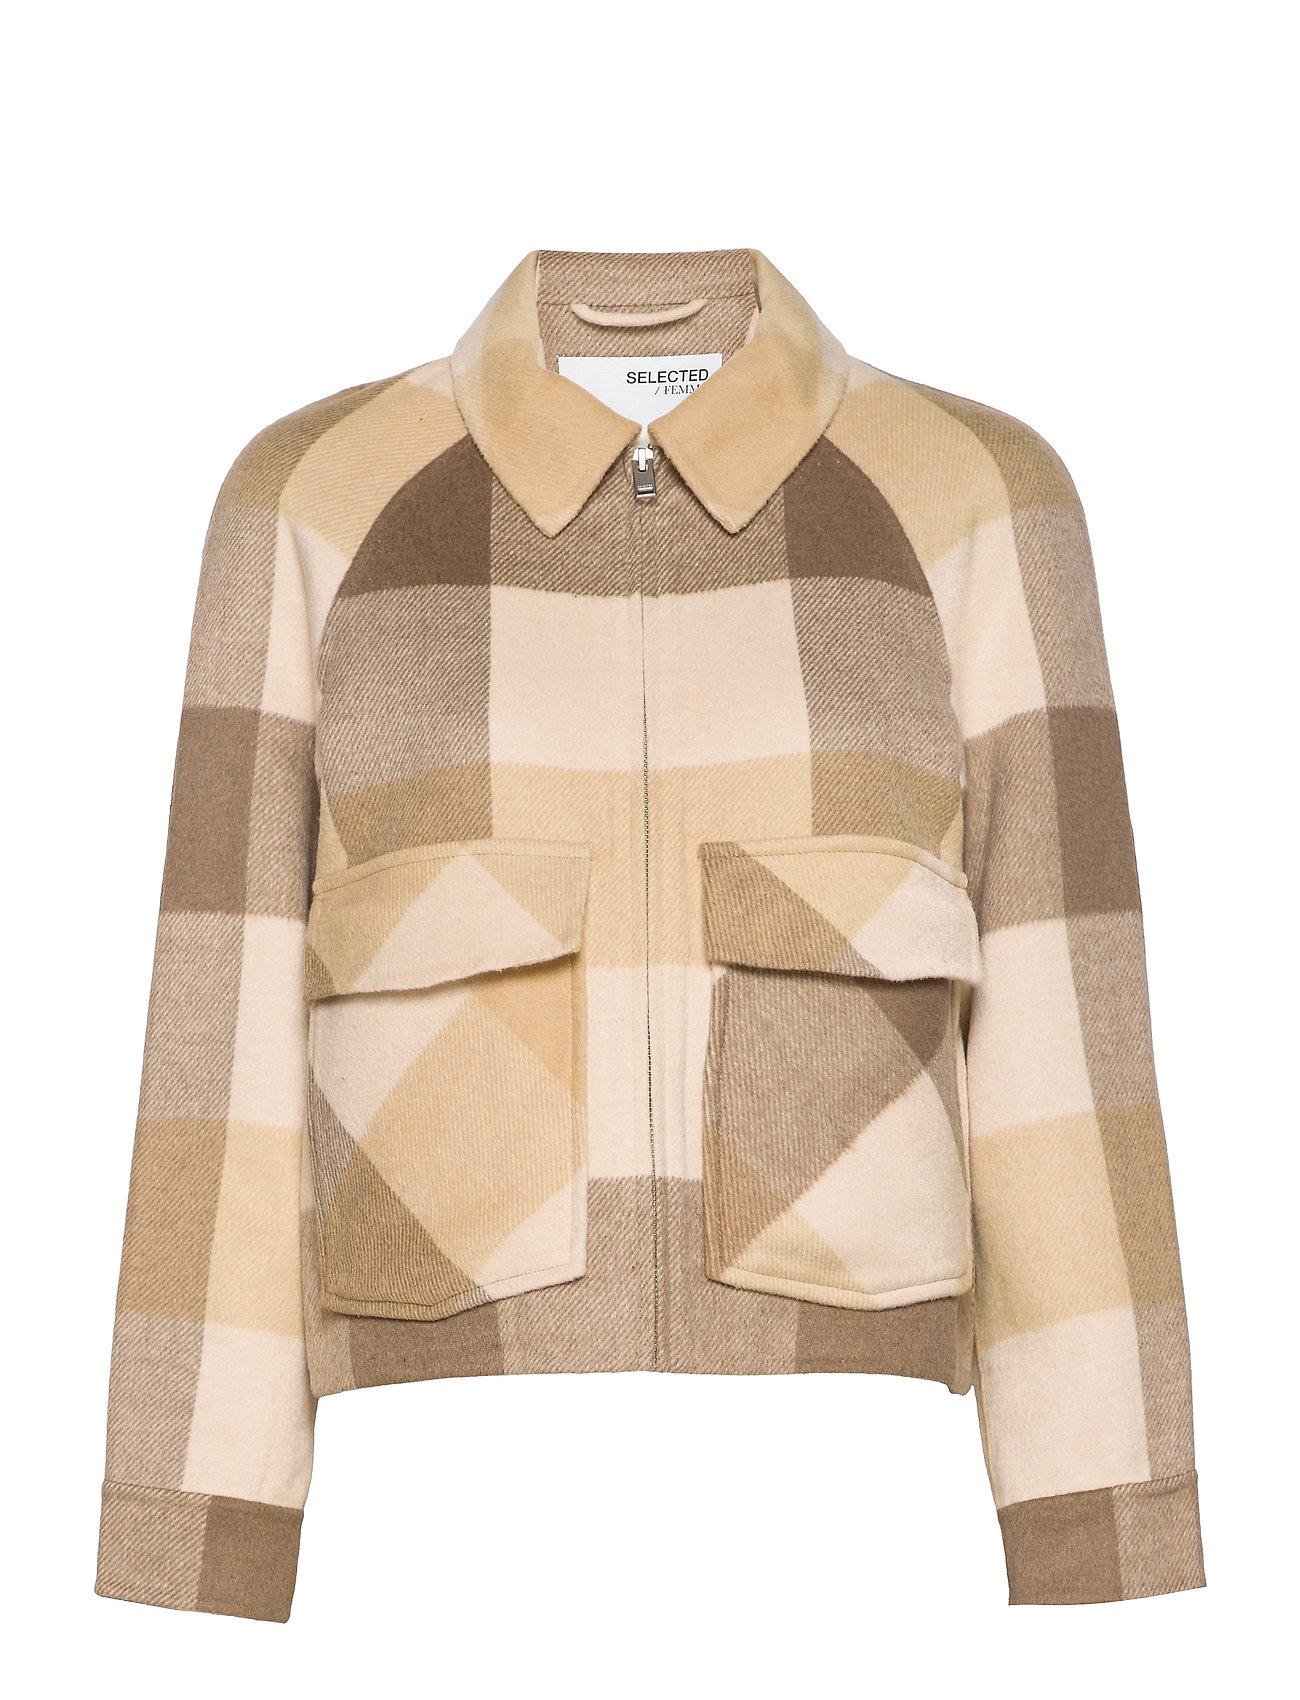 Slfreggy Short Handmade Jacket Check B Uldjakke Jakke Brun Selected Femme